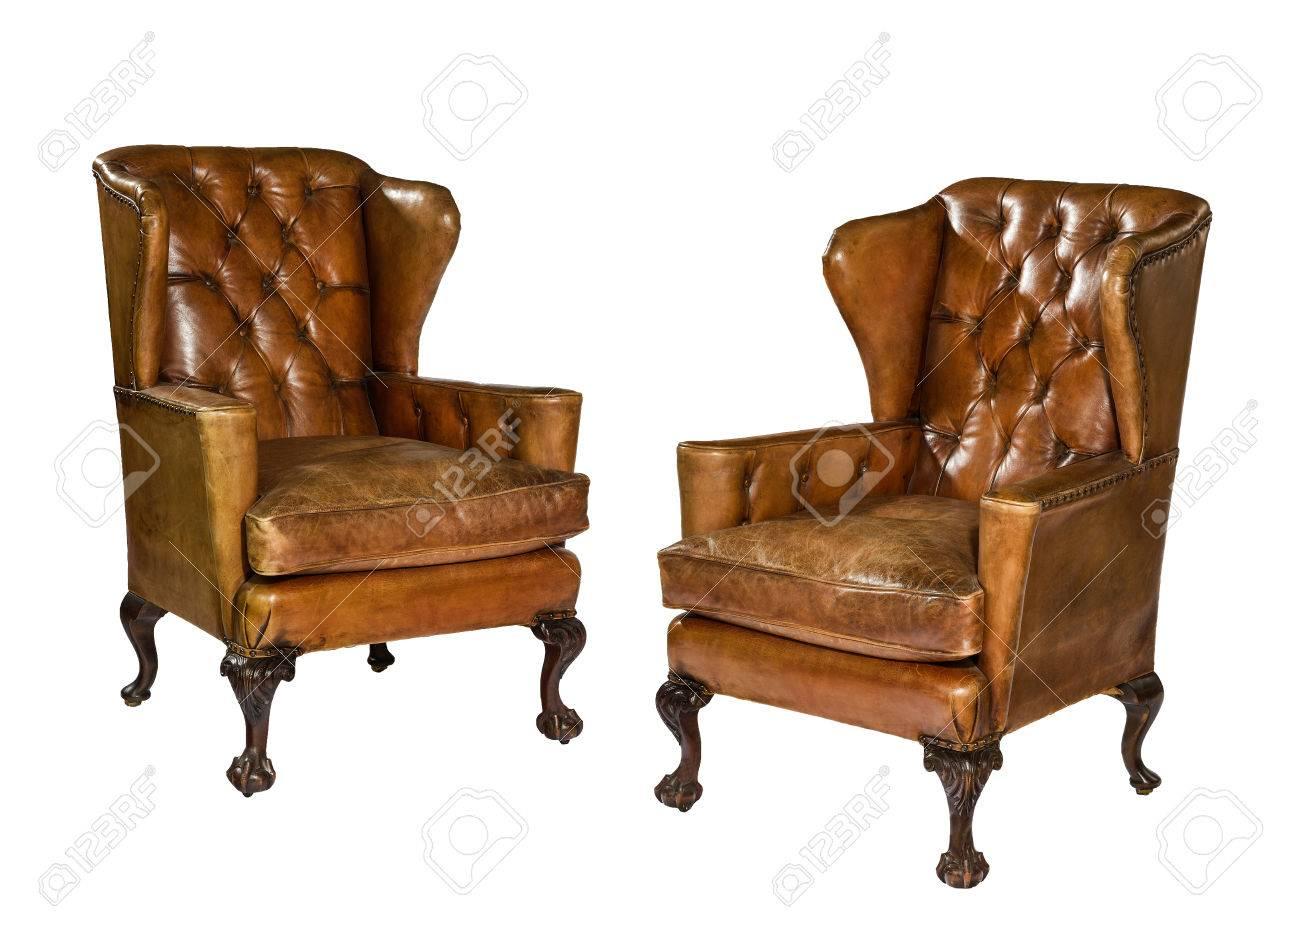 Paar Alte Antik Braun Flugel Leder Sessel 18 19 Jahrhundert